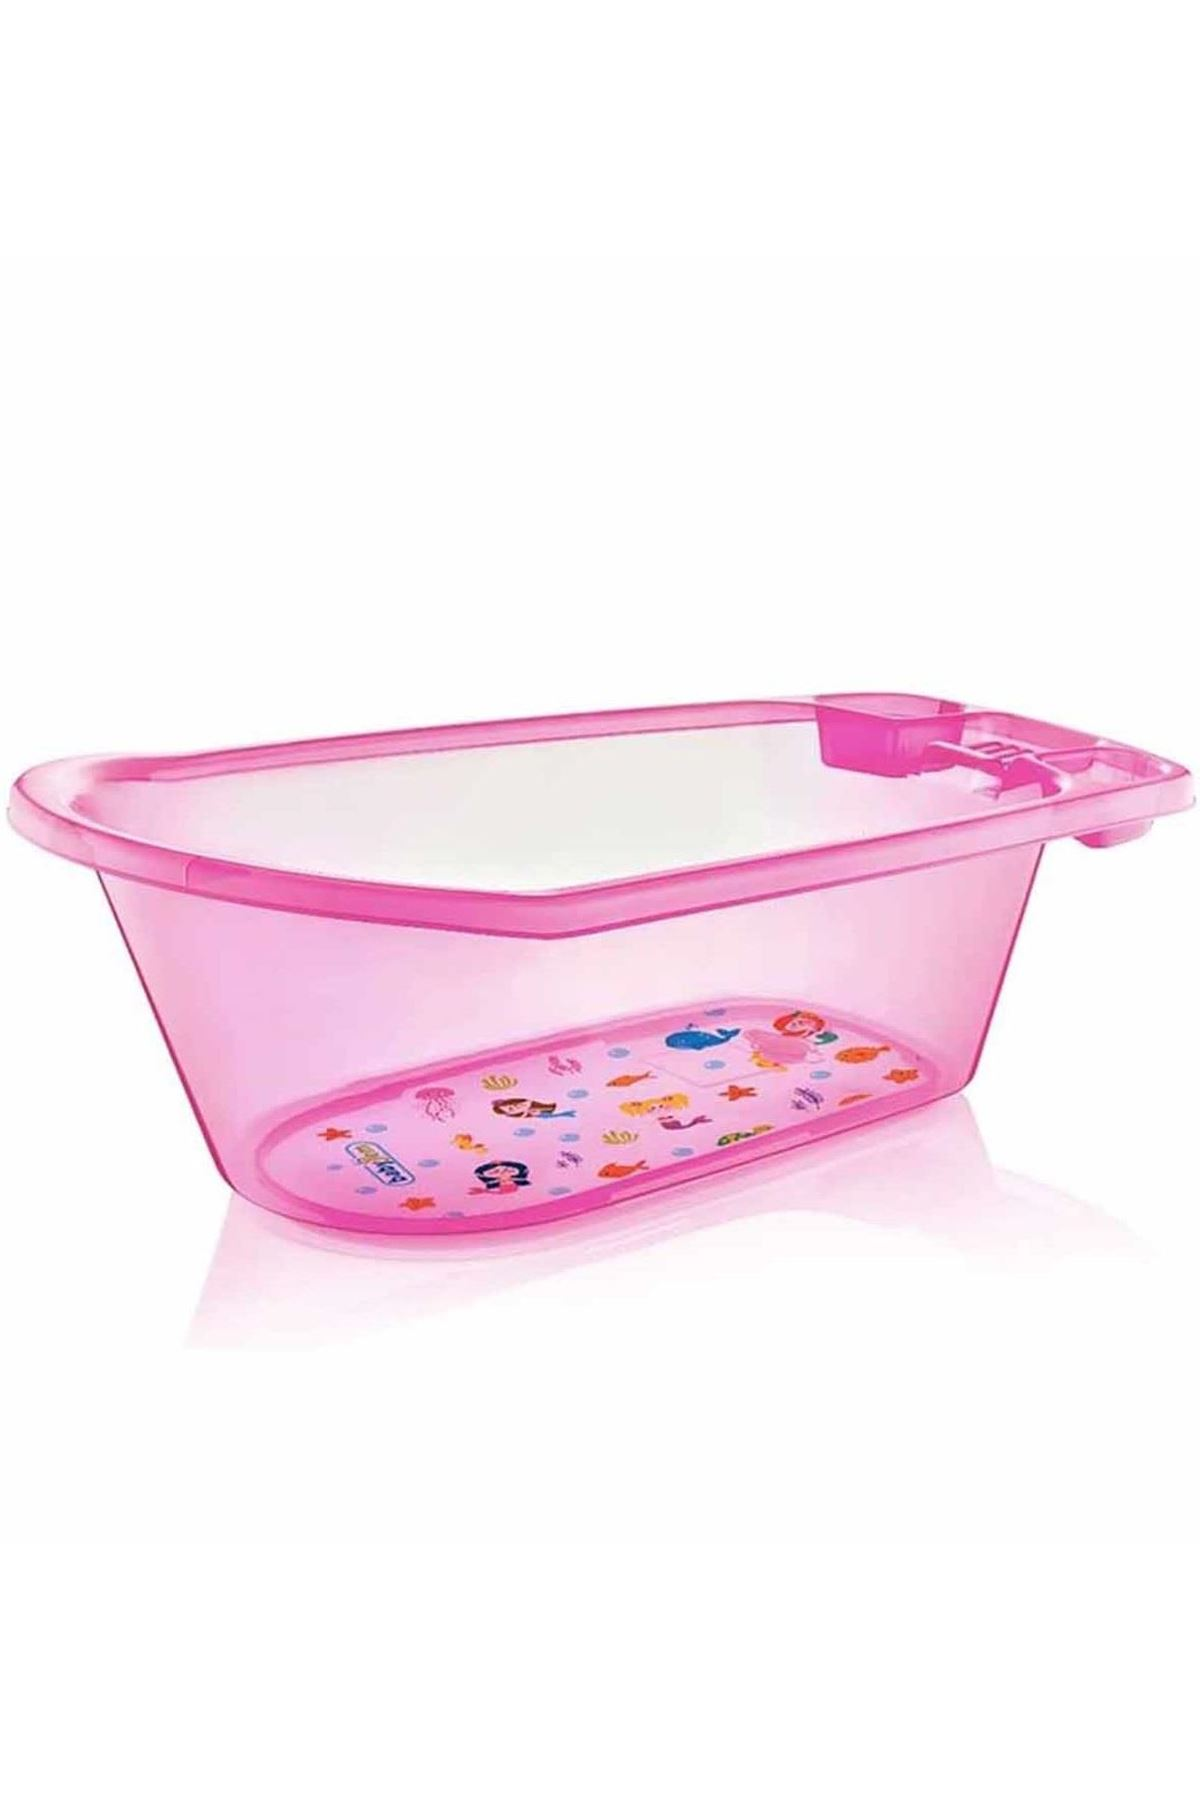 BabyJem Bebek Banyo Küveti Şeffaf Desenli 001 Pembe